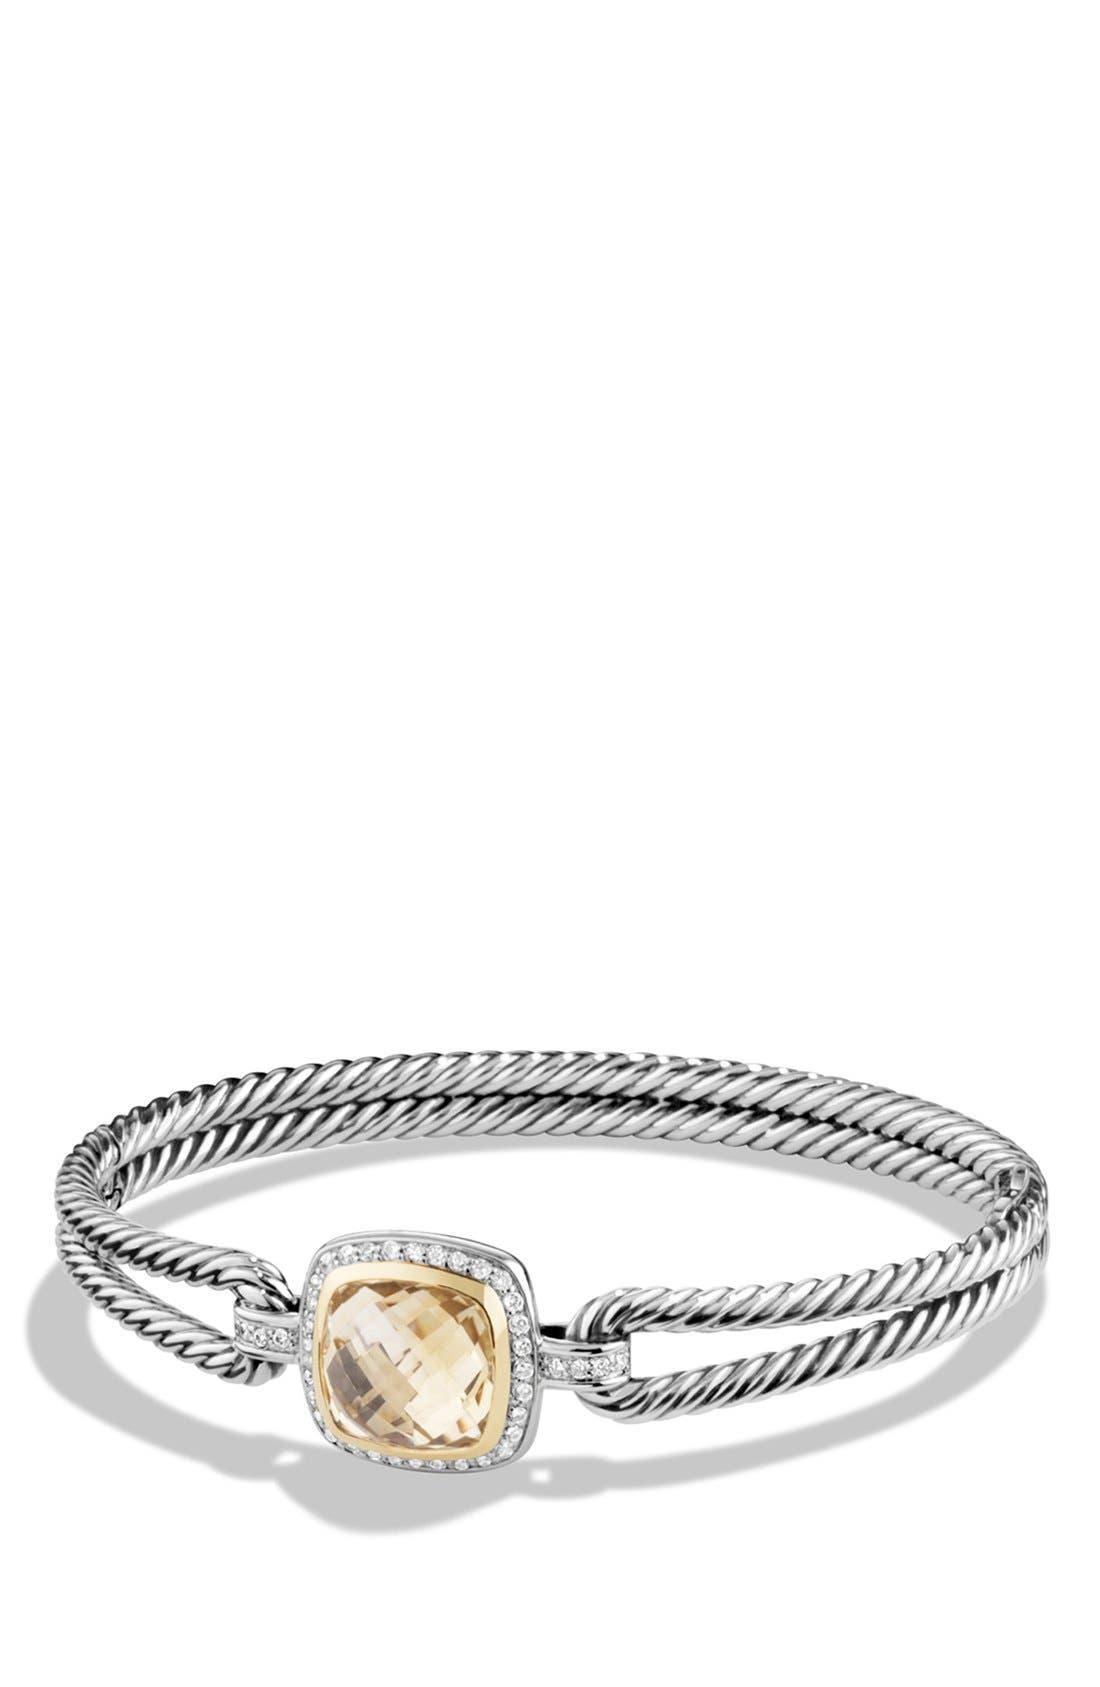 DAVID YURMAN Albion Bracelet with Diamonds and 18K Gold